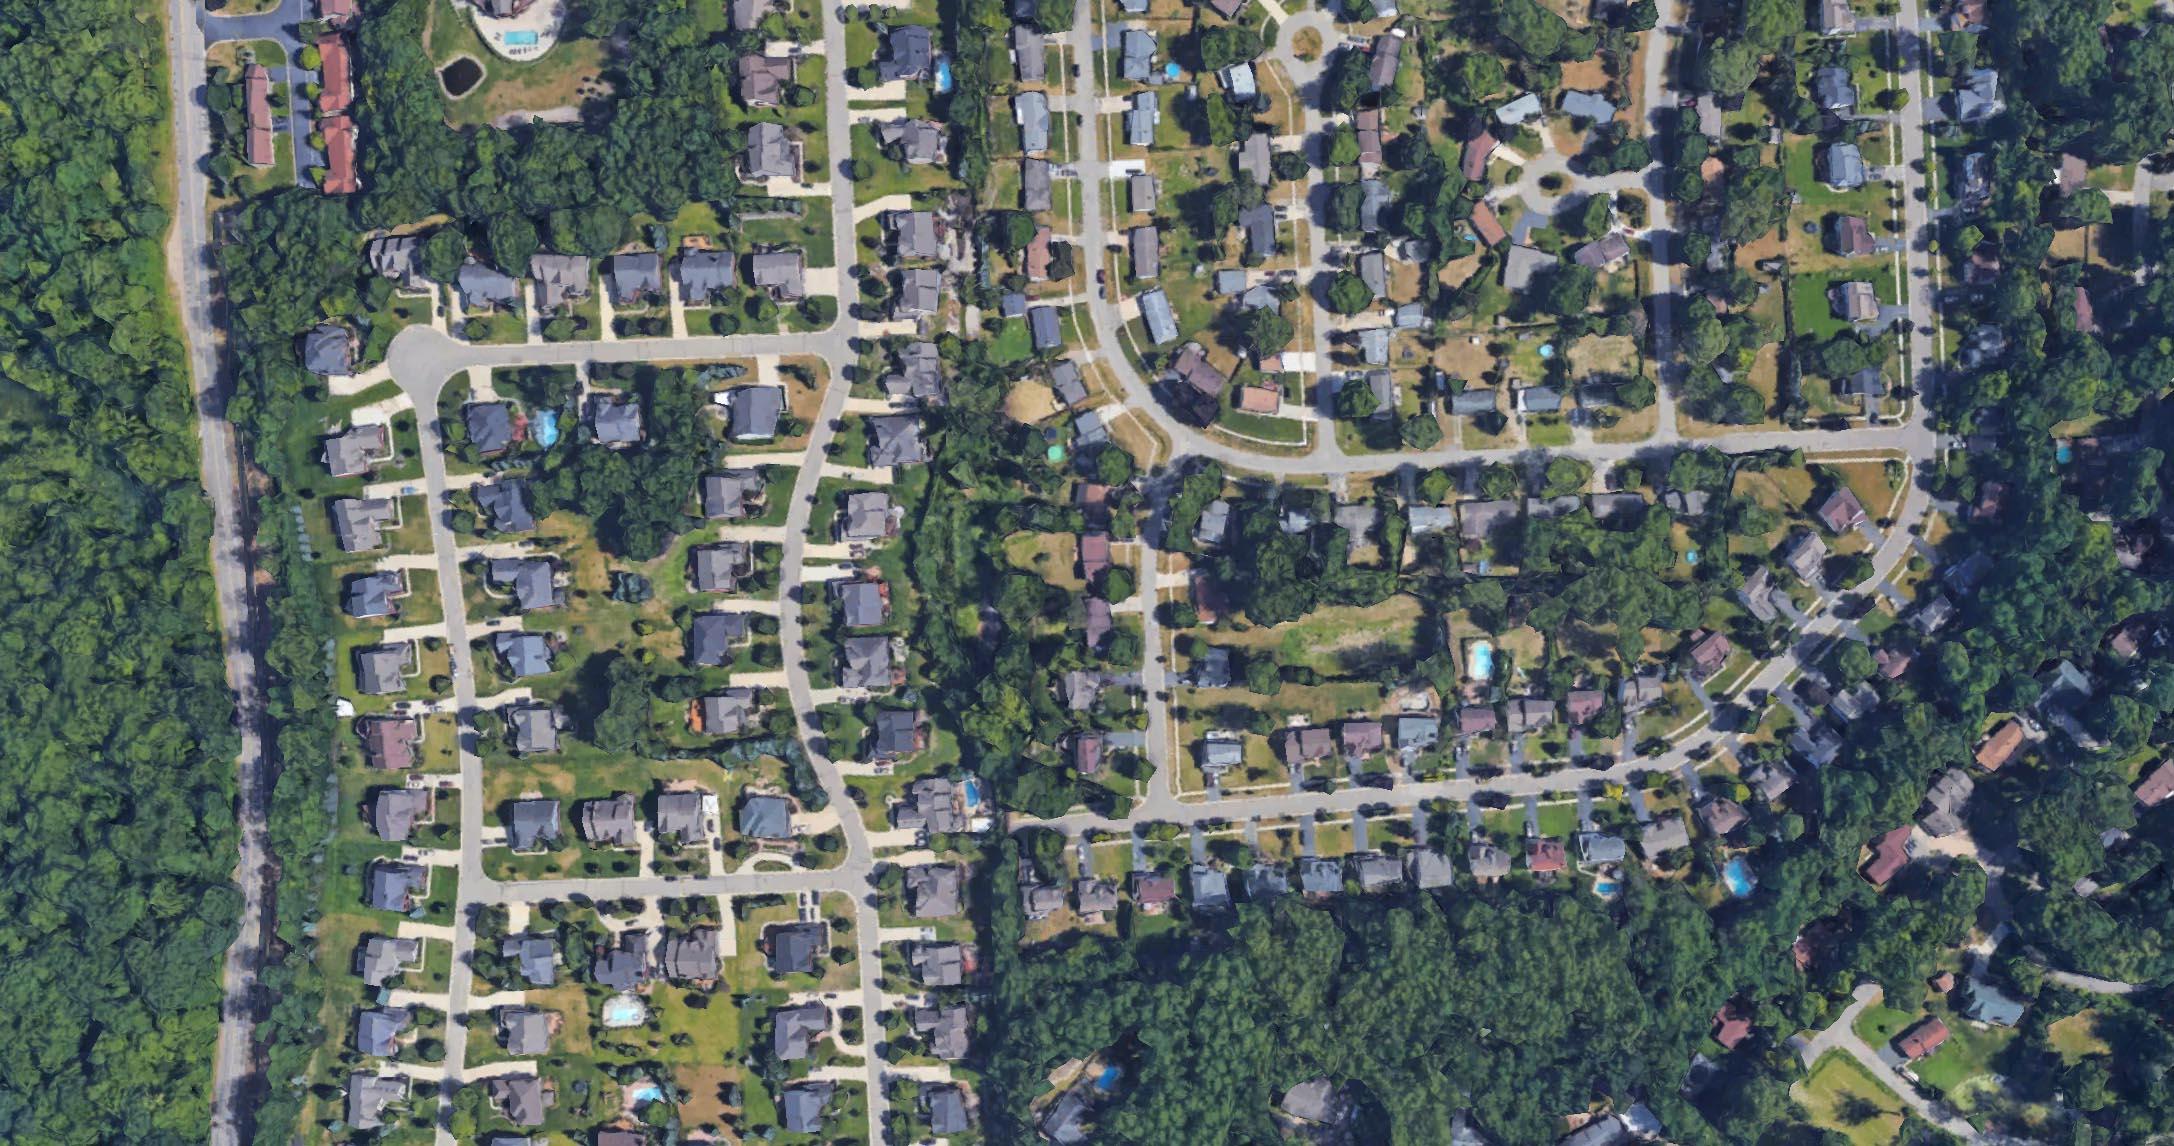 Aerial view of my neighborhood via Google Earth